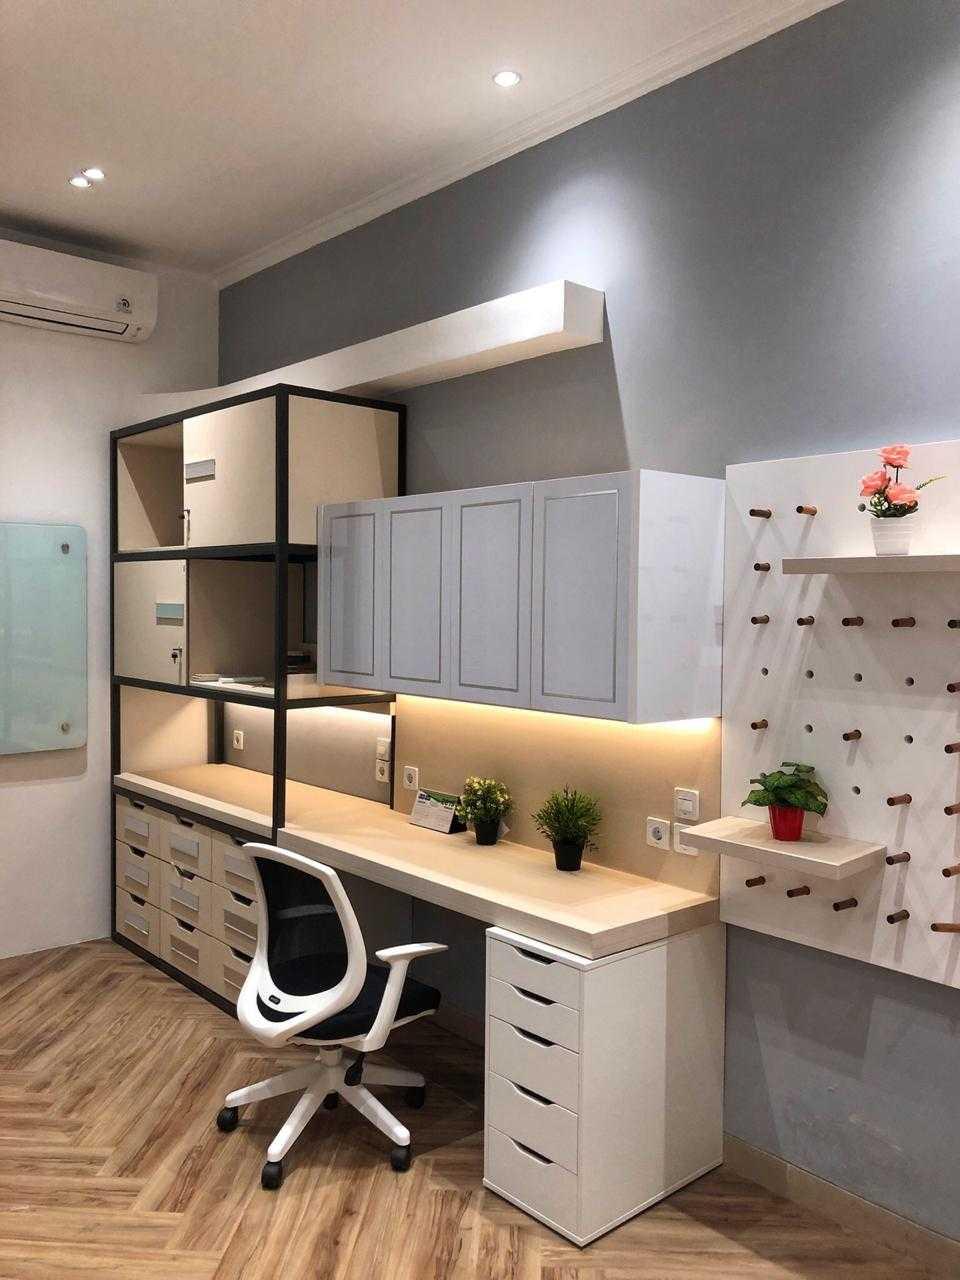 Imelda Small Office For Lucan Shop Serpong, Kota Tangerang Selatan, Banten, Indonesia Serpong, Kota Tangerang Selatan, Banten, Indonesia Imelda-Small-Office-For-Lucan-Shop  67414